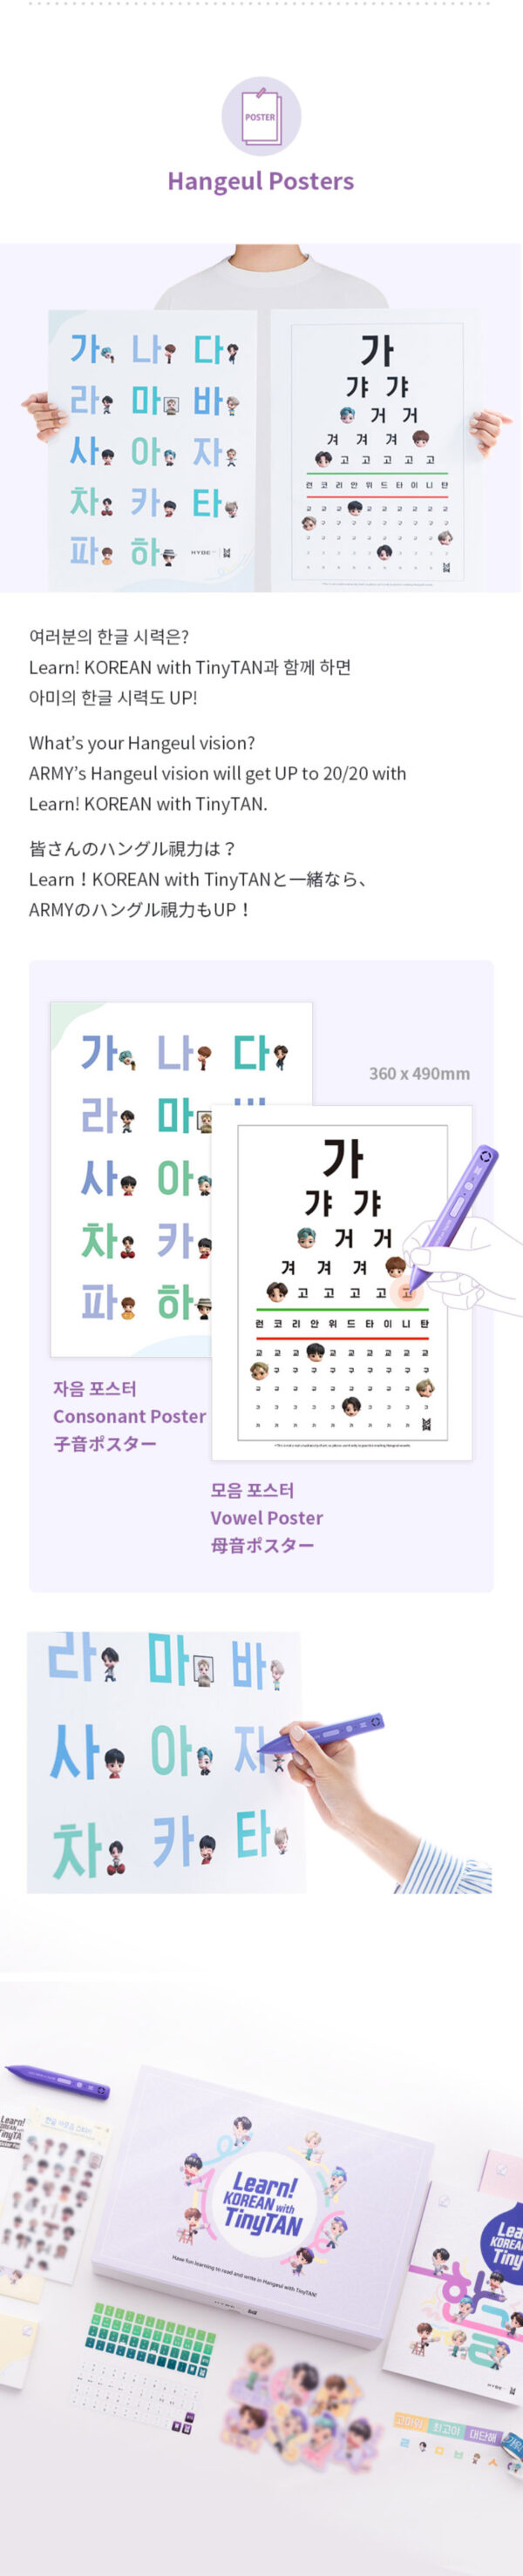 Pre Order BTS Learn KOREAN With TinyTAN 10